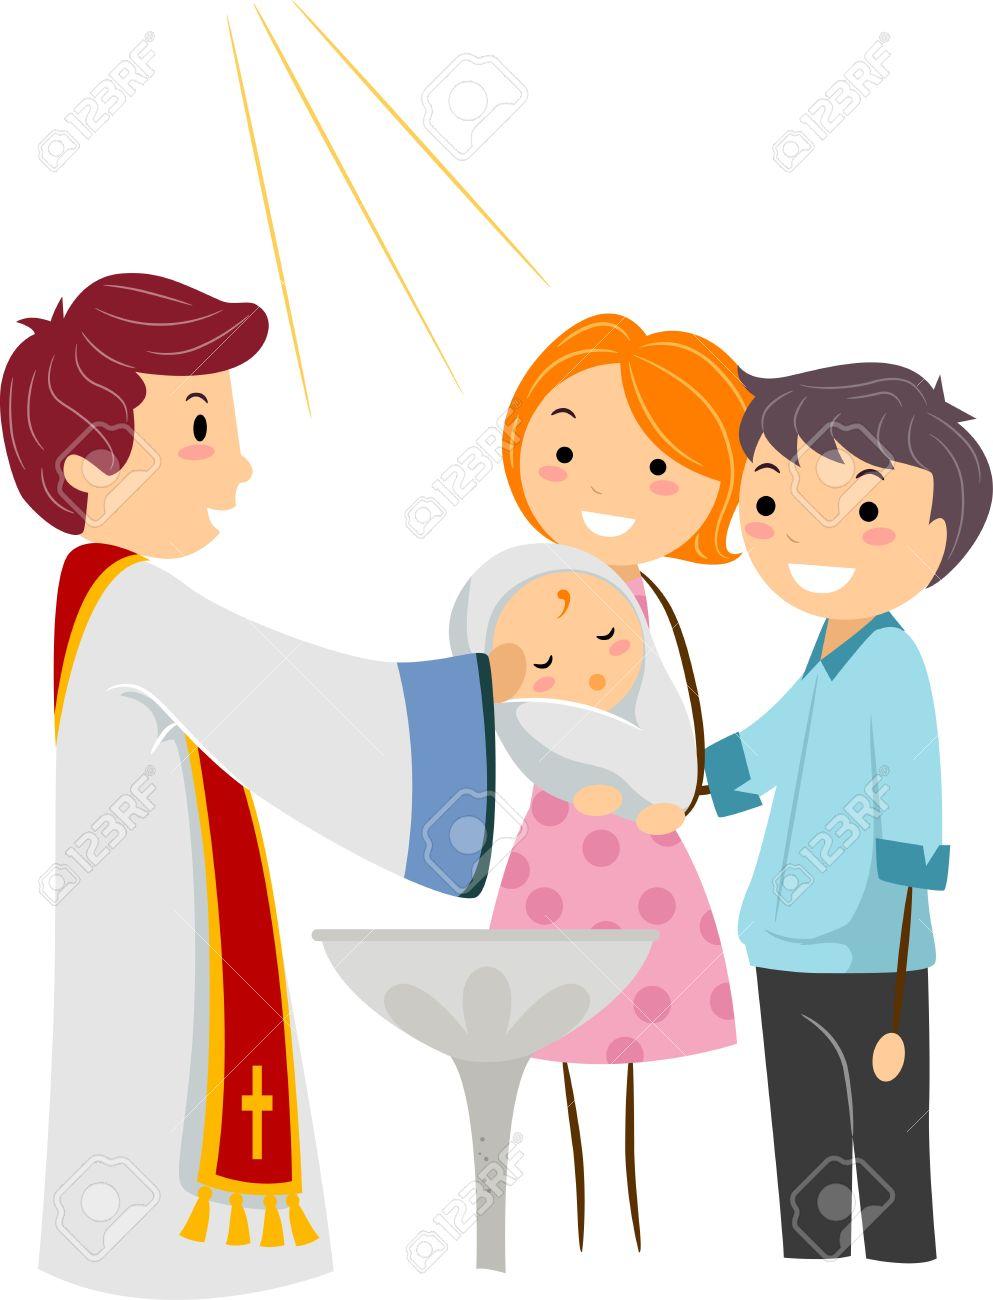 hight resolution of illustration illustration of a priest baptizing a child